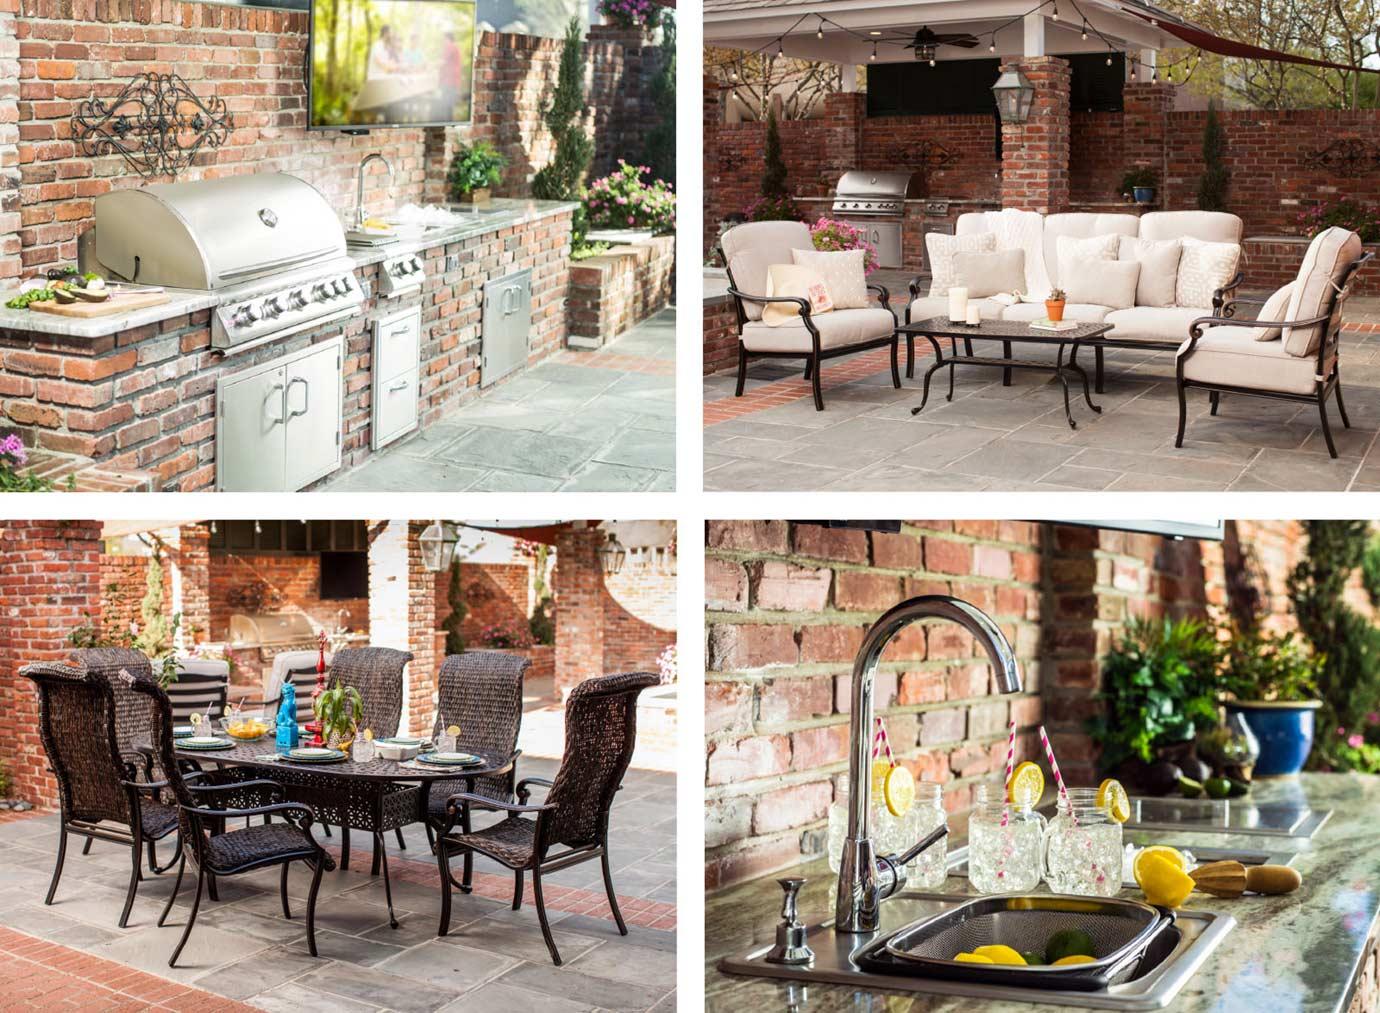 Brick Outdoor Kitchen with Blaze Grill